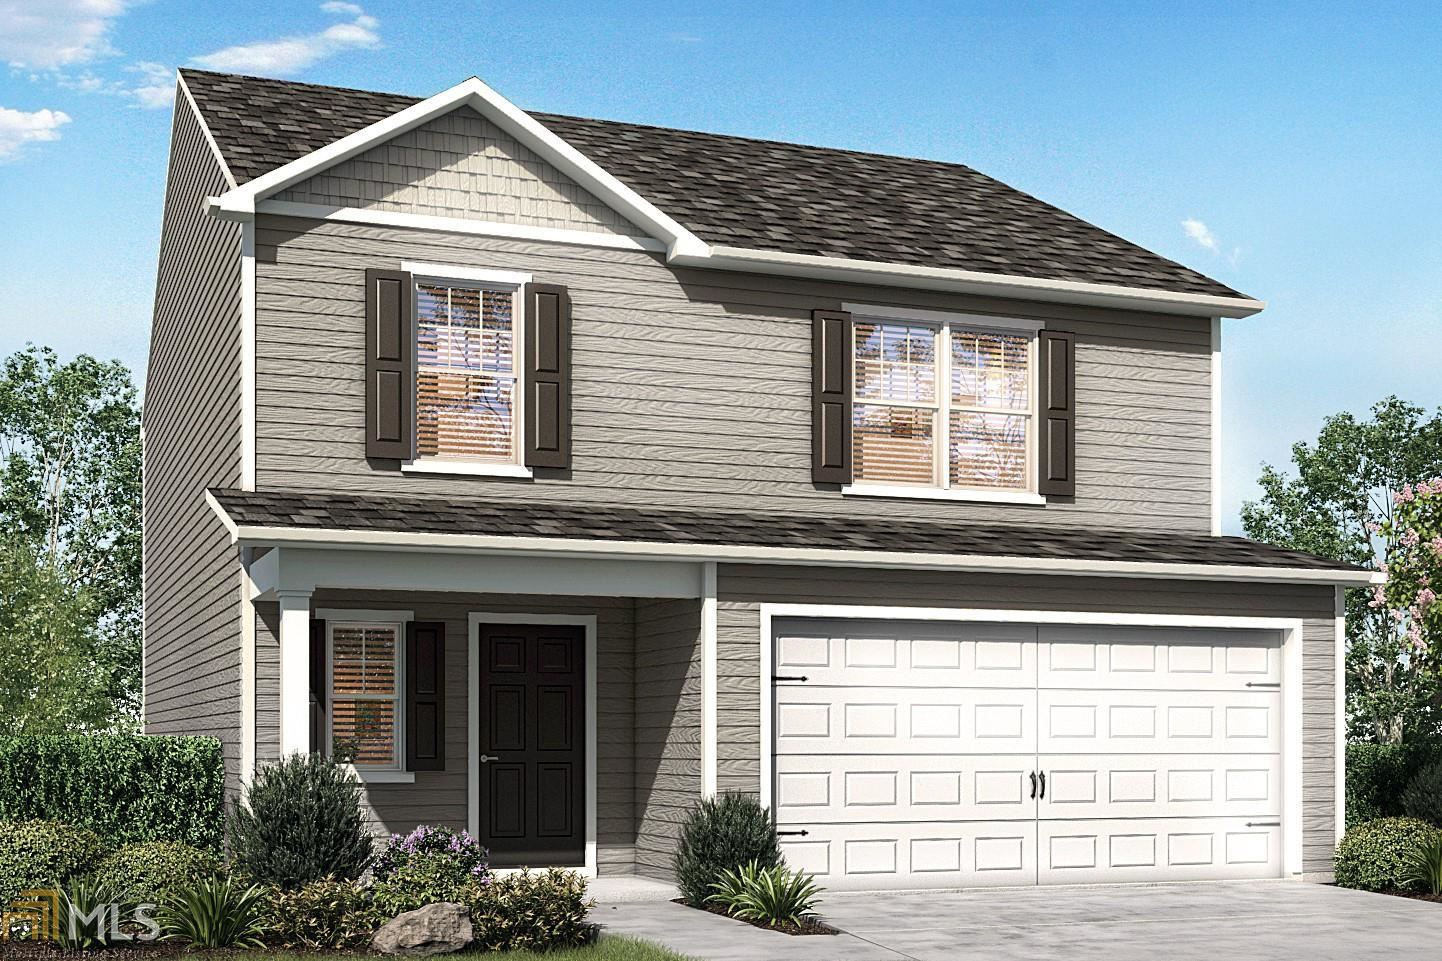 3398 Clawing Hawk Way, Douglasville, GA 30135 - MLS#: 8902777